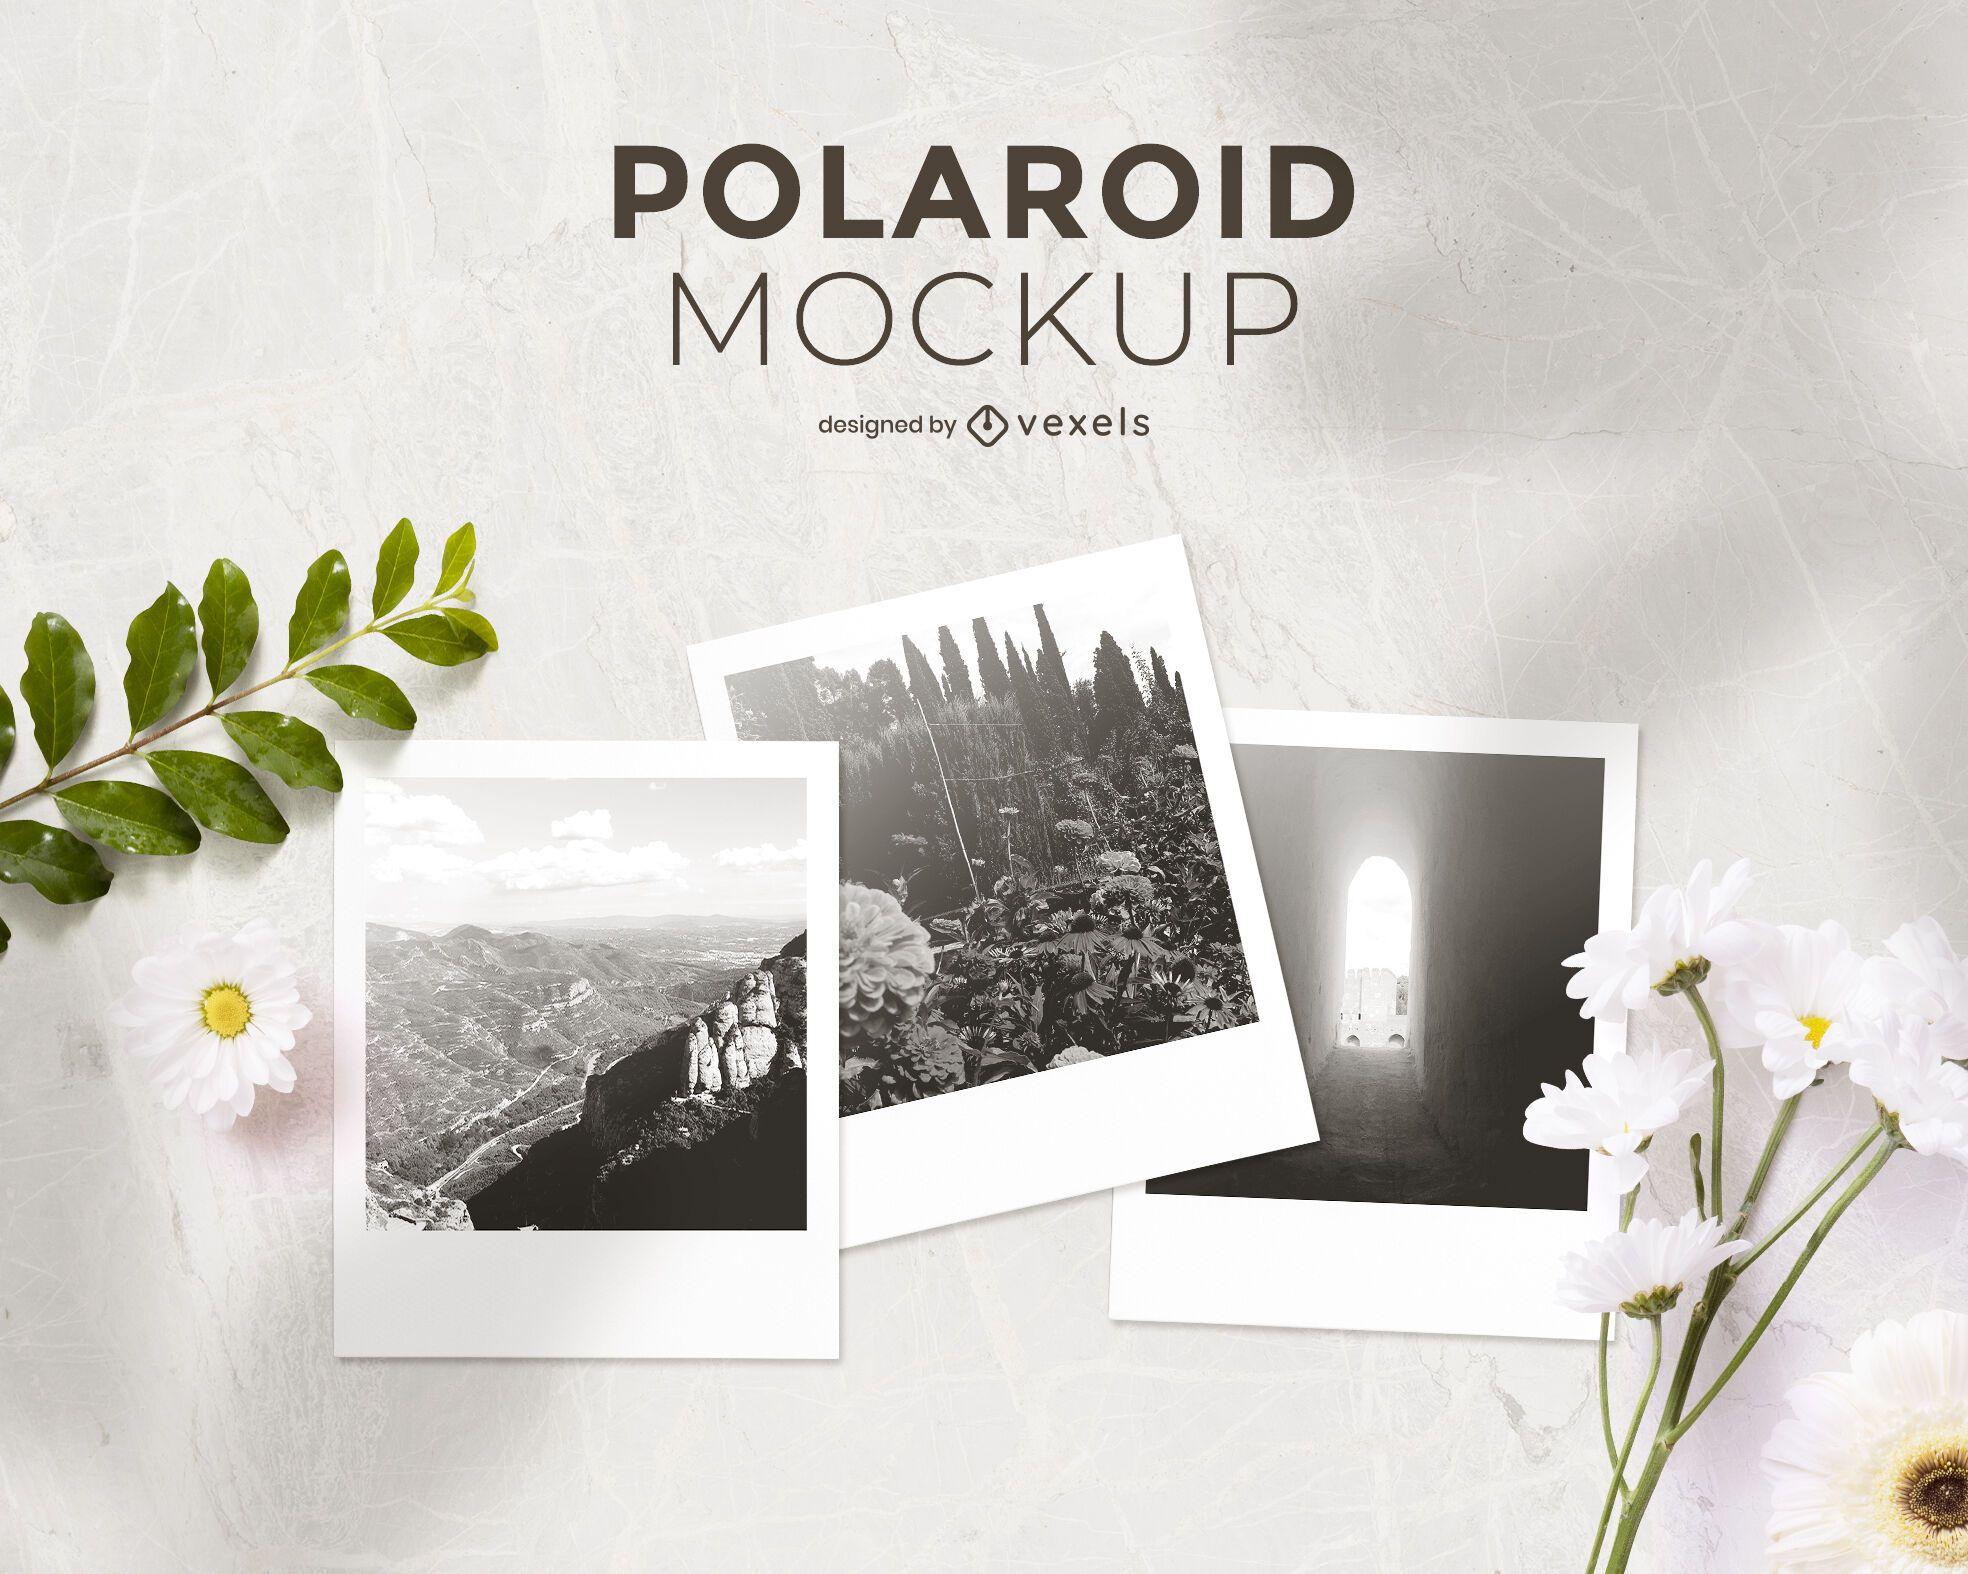 Polaroid mockup composition